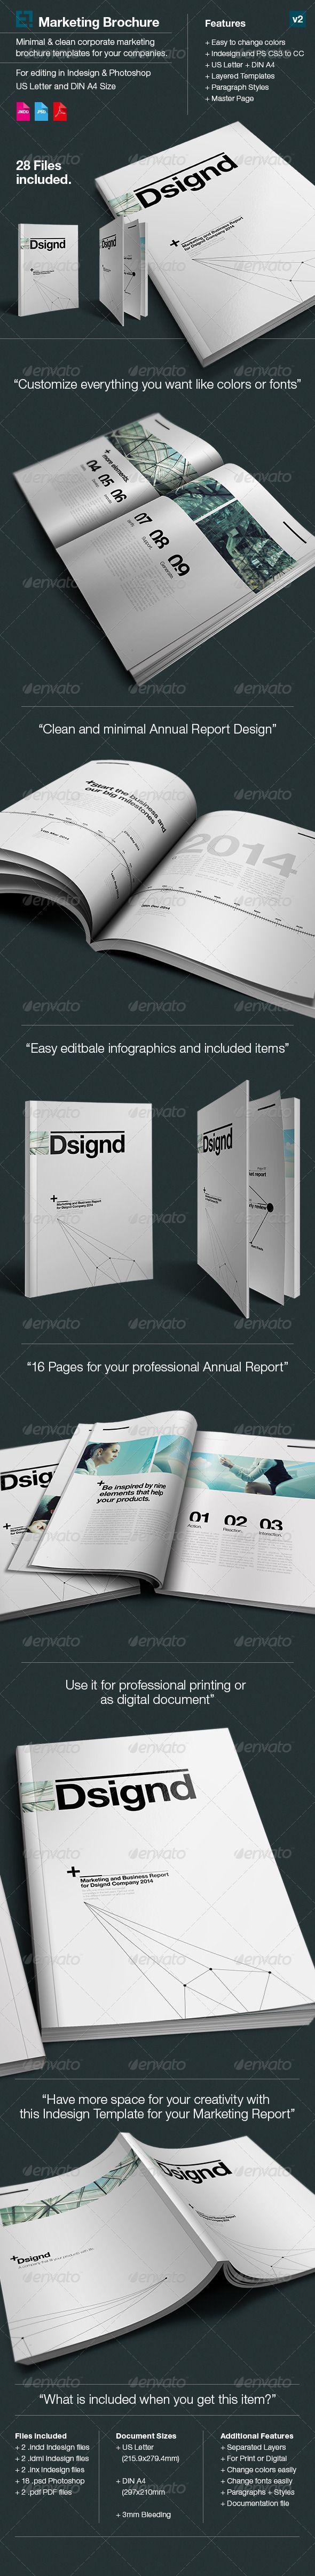 Suisse Design Marketing Report  Dsignd  Marketing Report